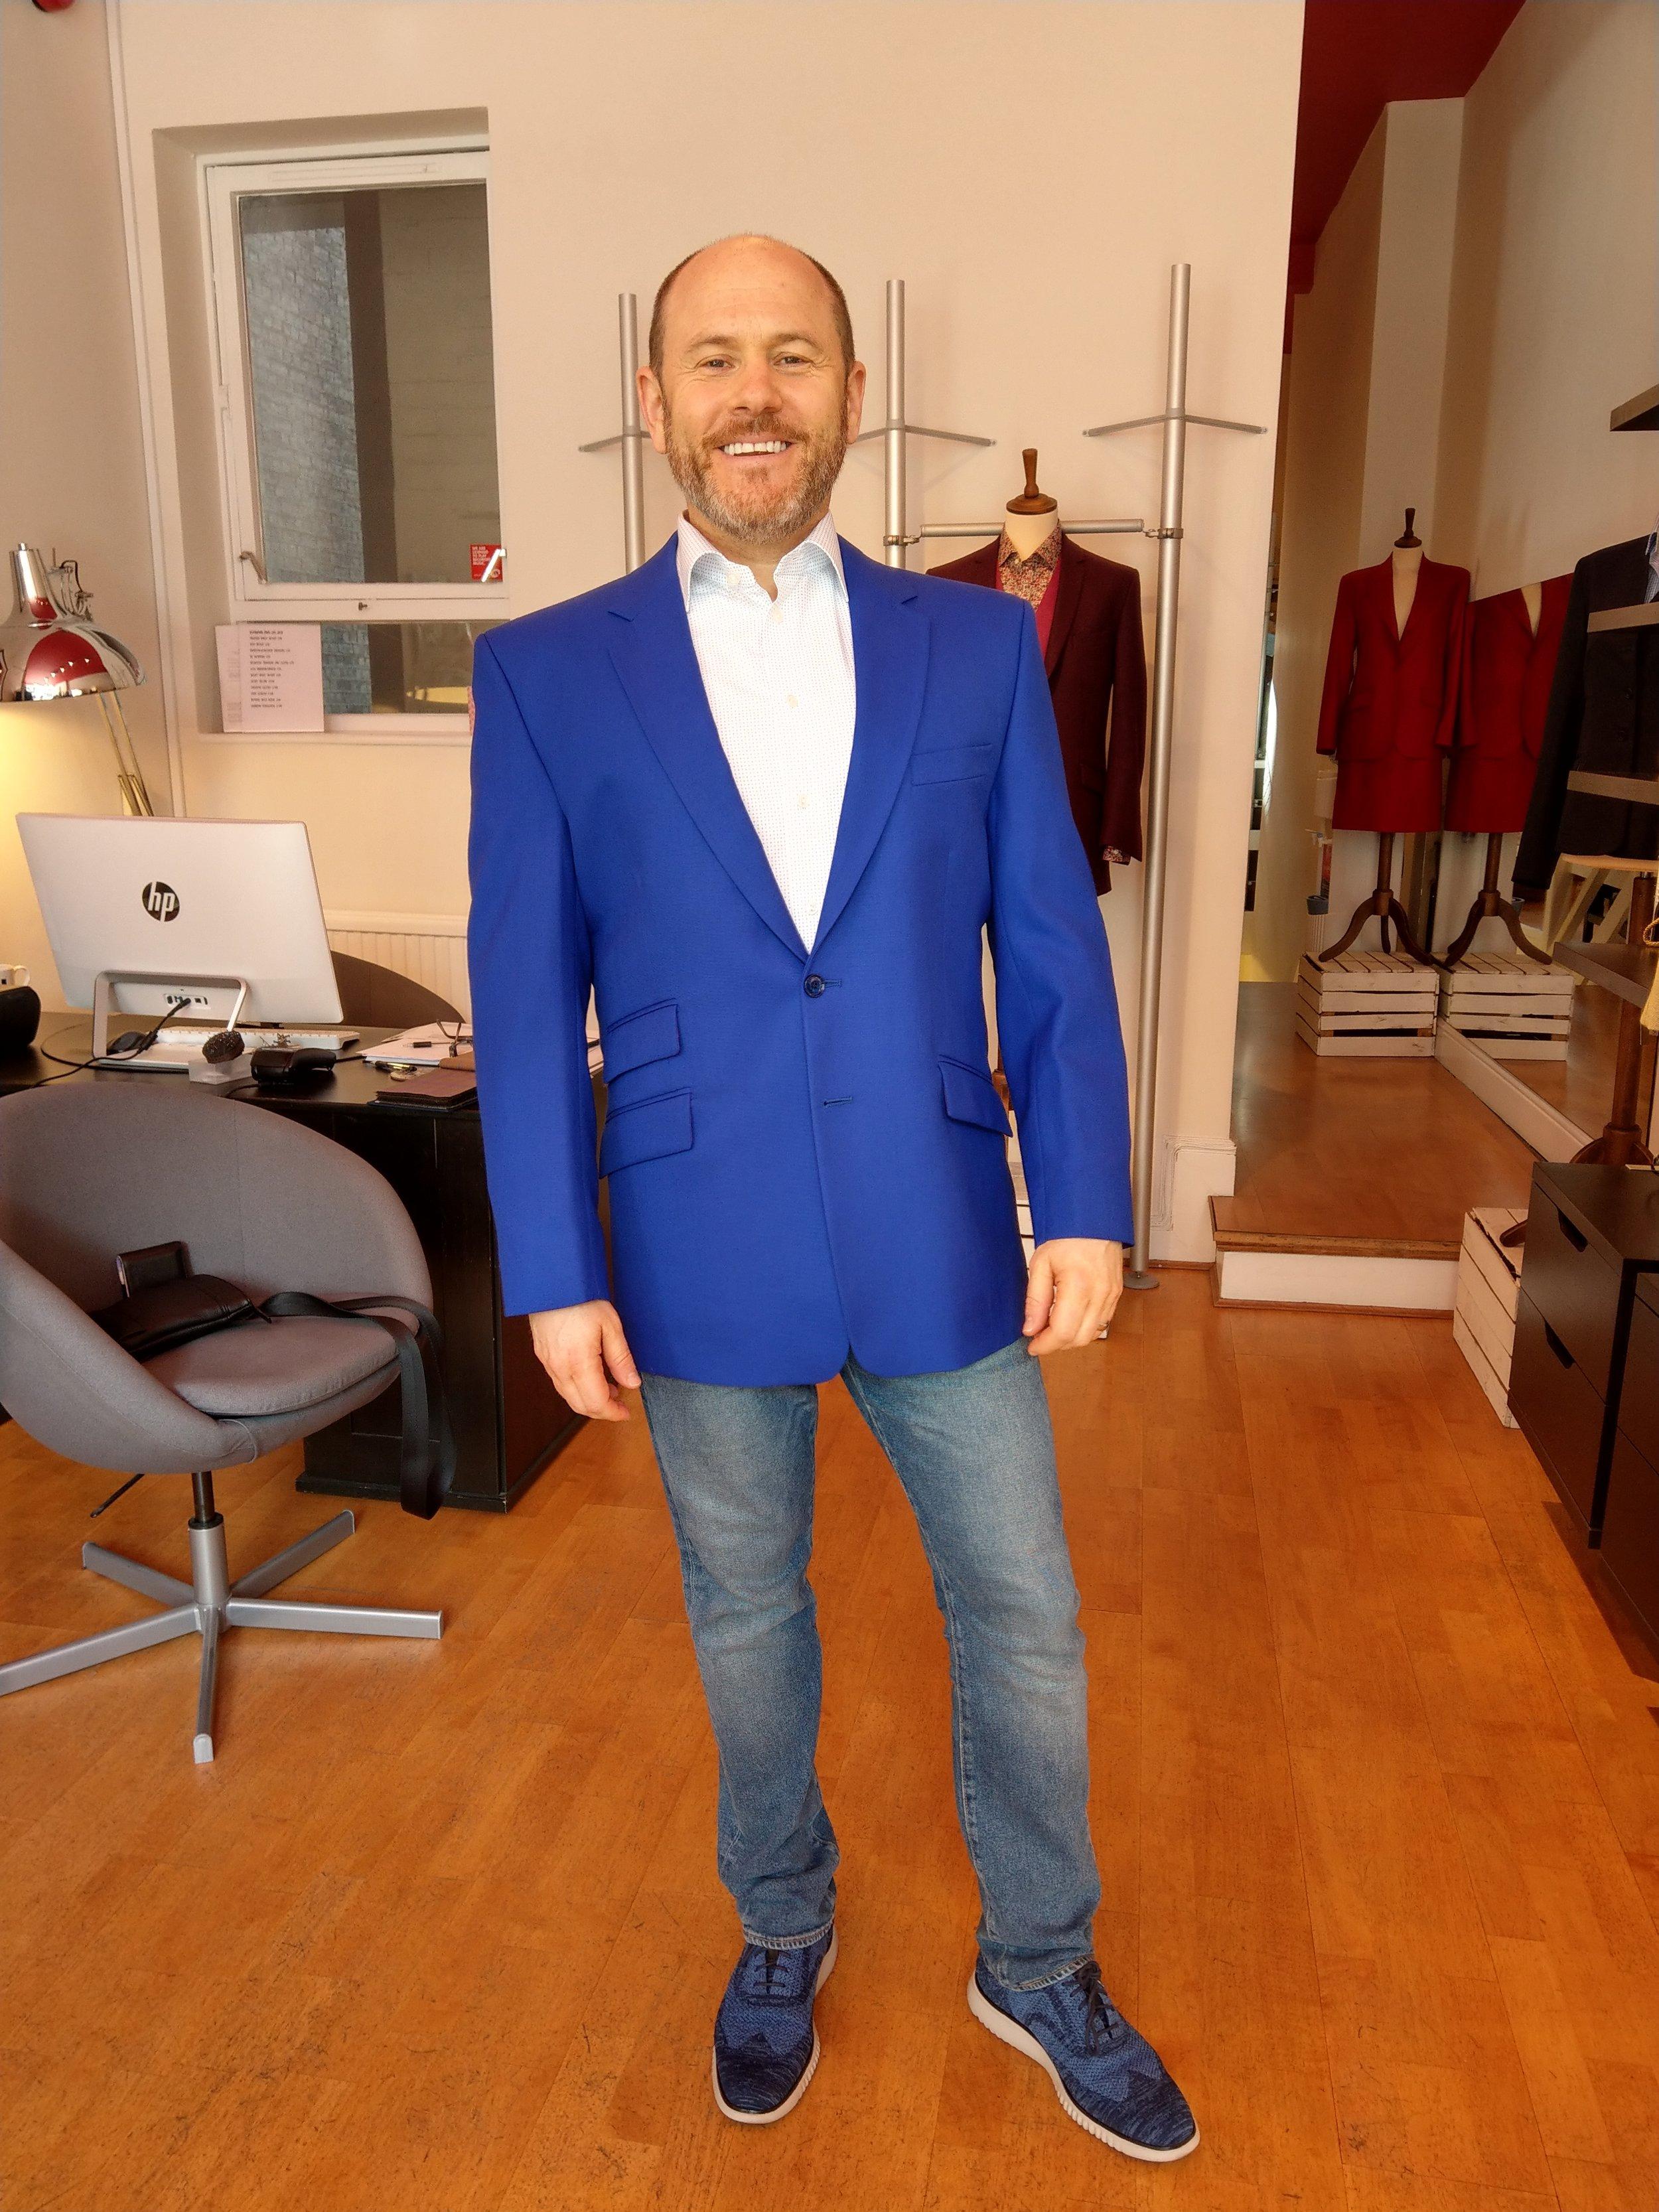 susannah-hall-bespoke-tailor-blue-jacket-harrisons-bright-made-uk-britain.jpg